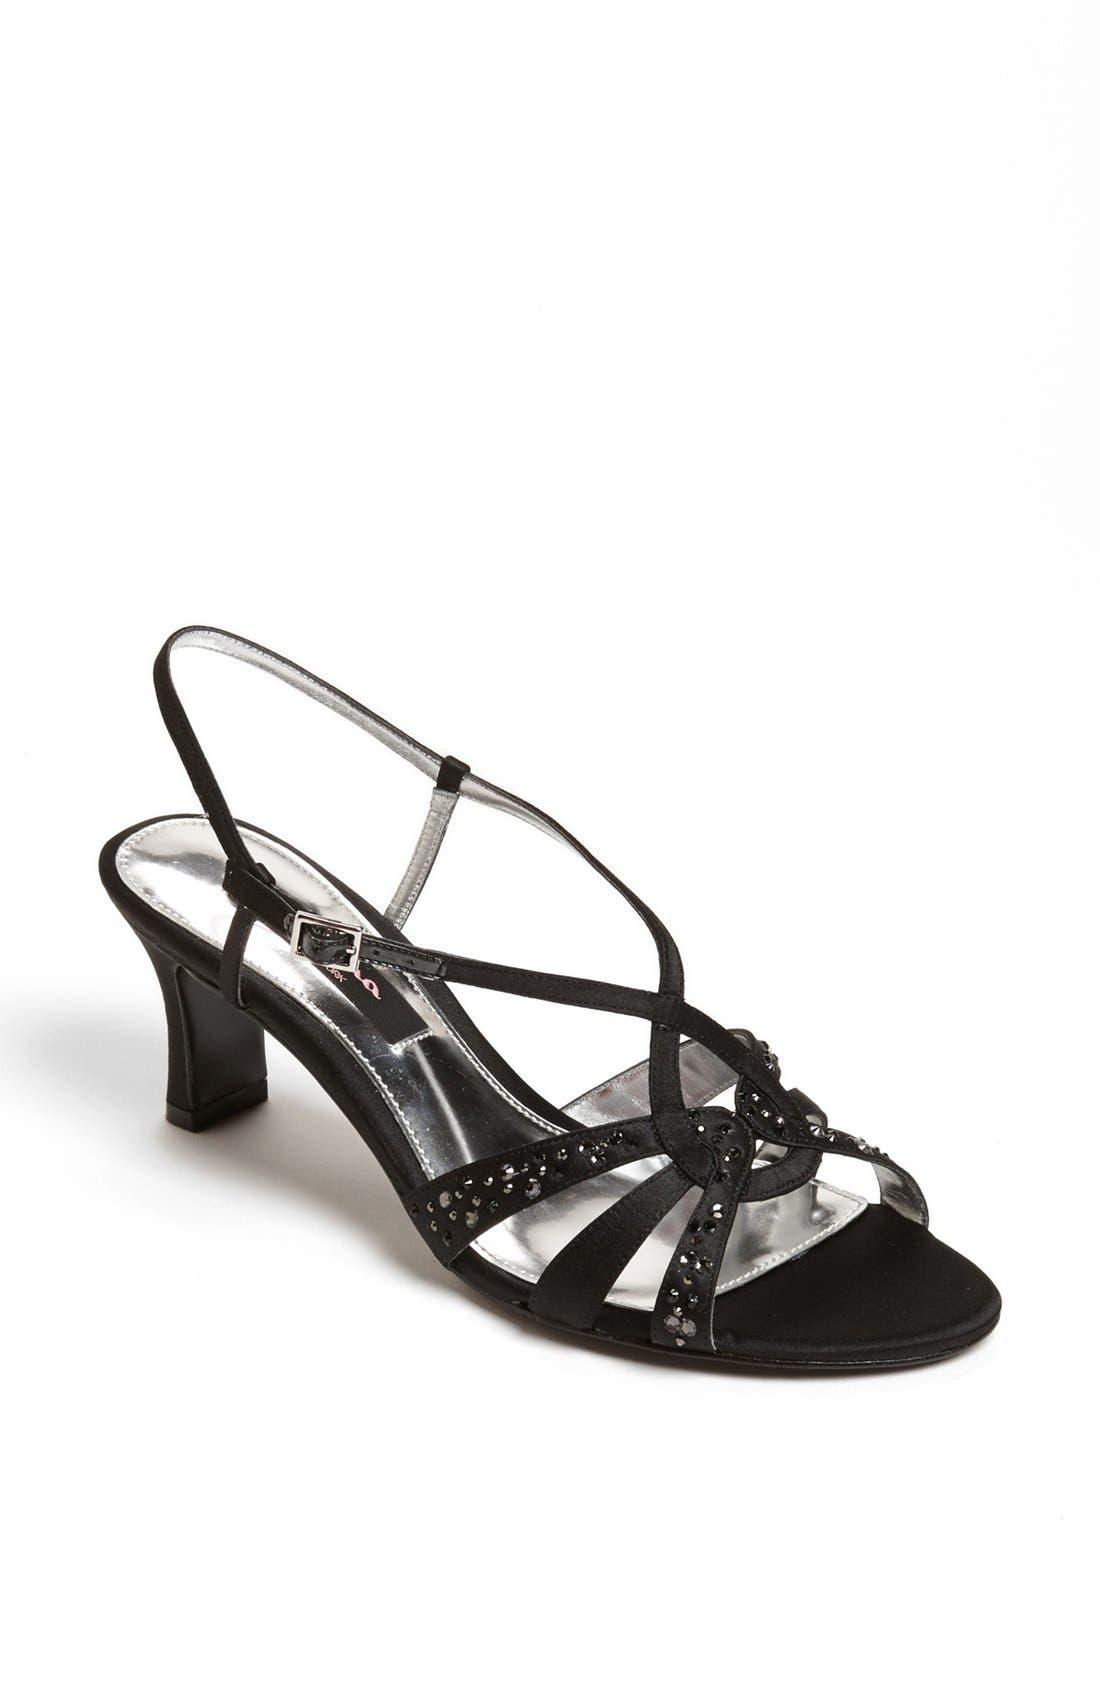 Alternate Image 1 Selected - Nina 'Golby' Sandal